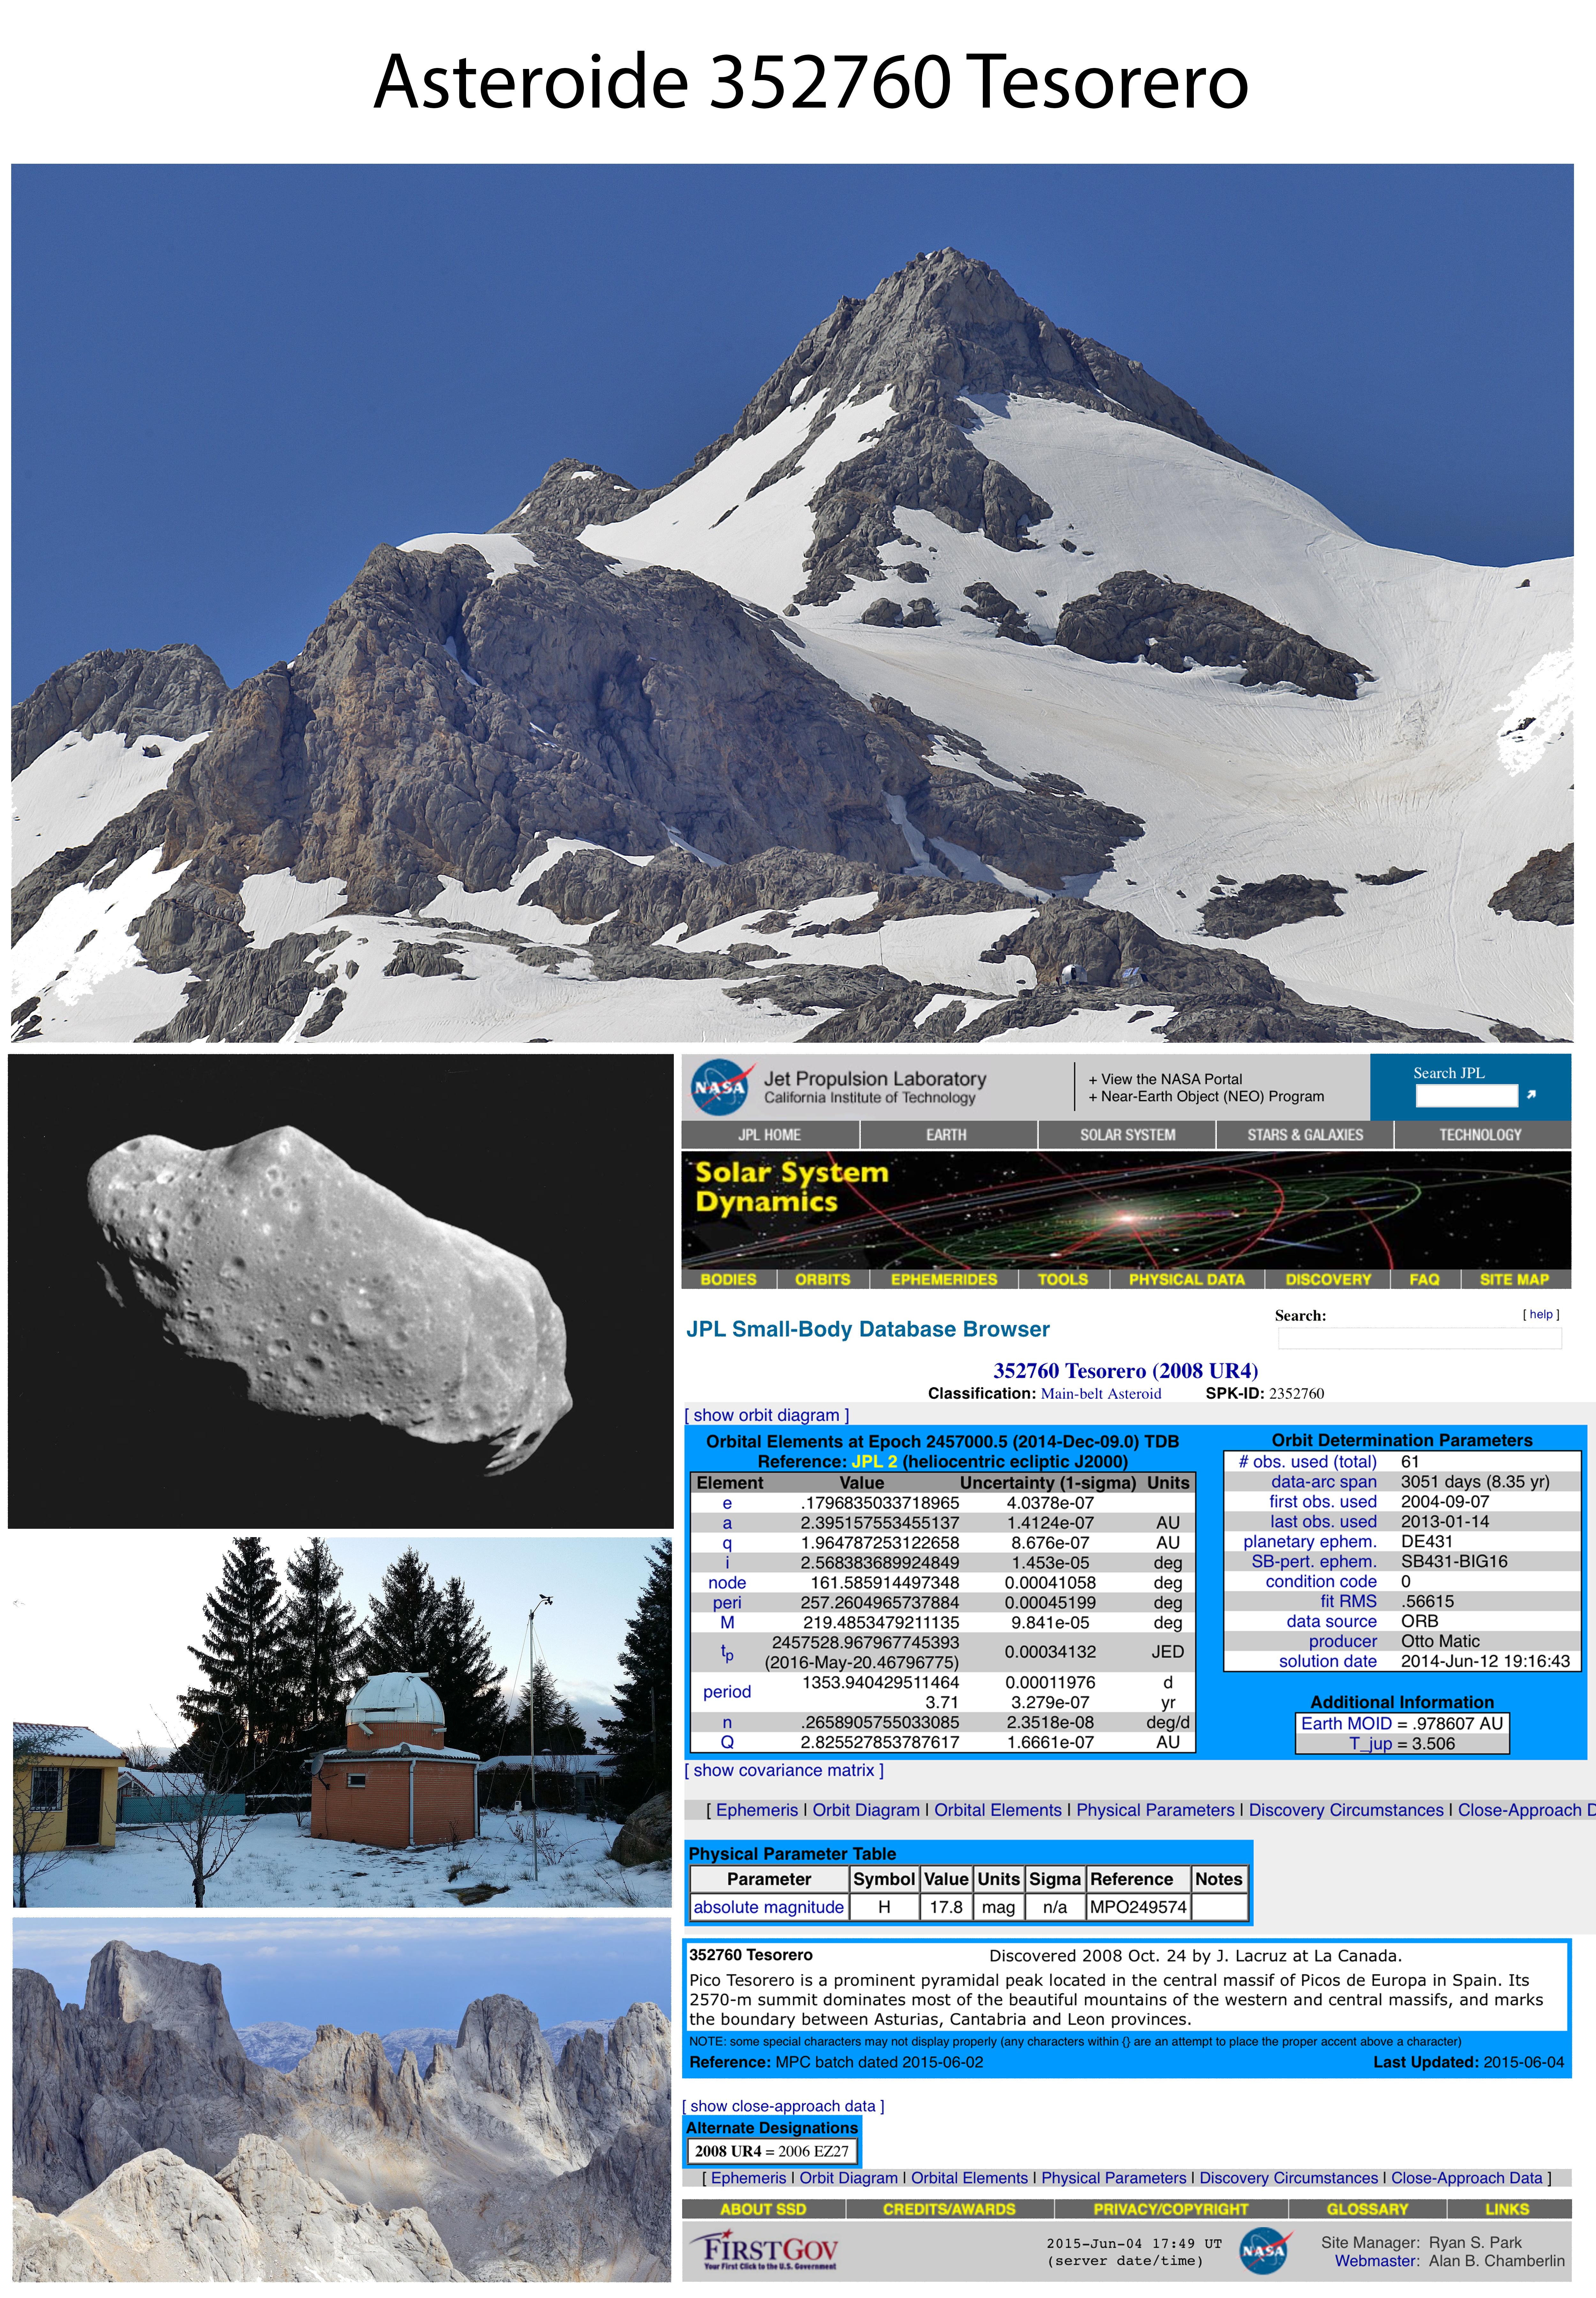 File:AsteroideTesorero jpg - Wikimedia Commons